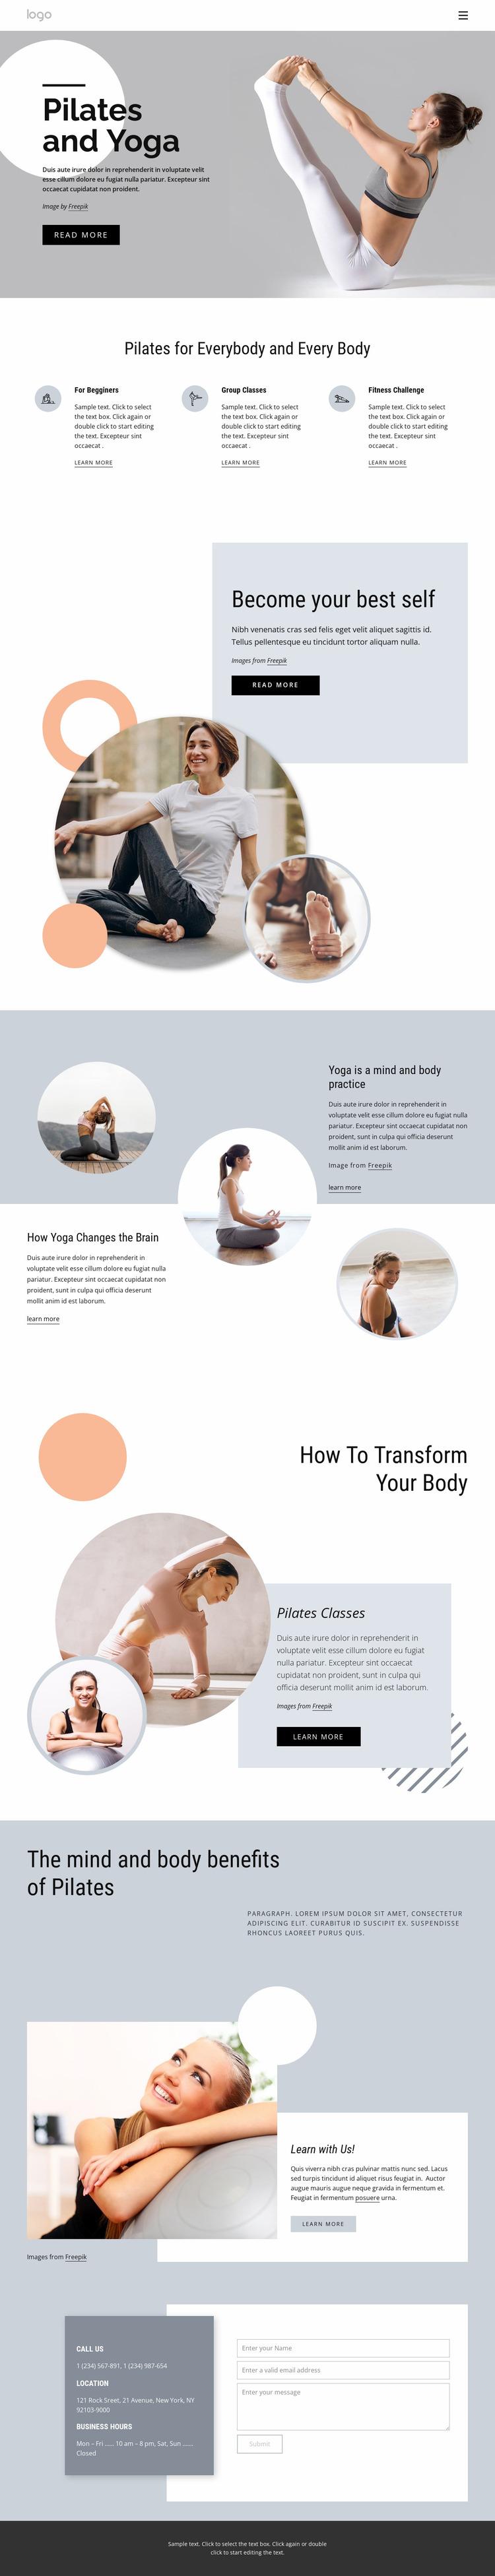 Pilates and yoga center Website Mockup